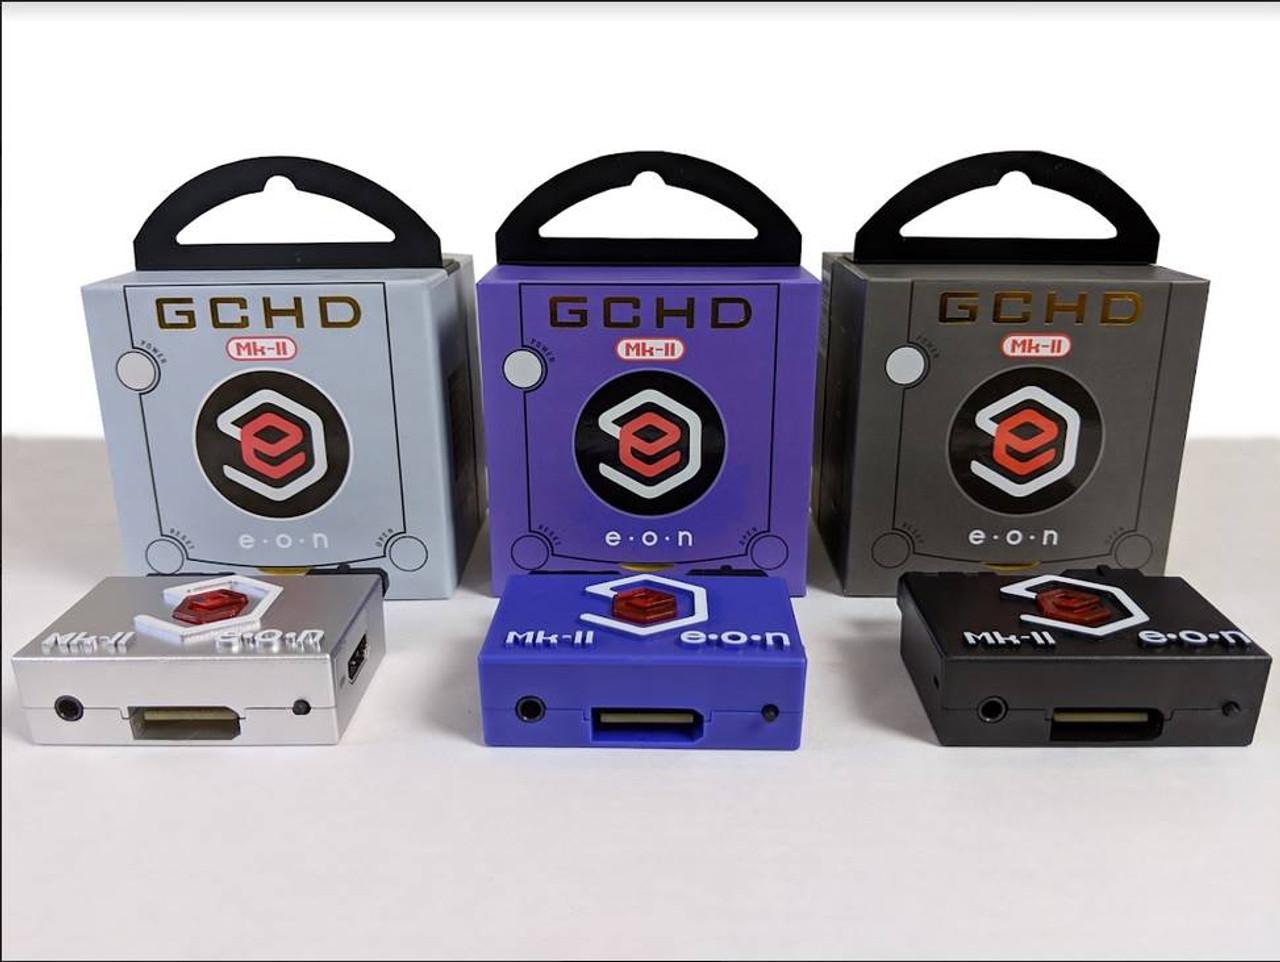 Gchd Mk Ii Plug N Play Hdmi Gamecube Adapter Hd 480p